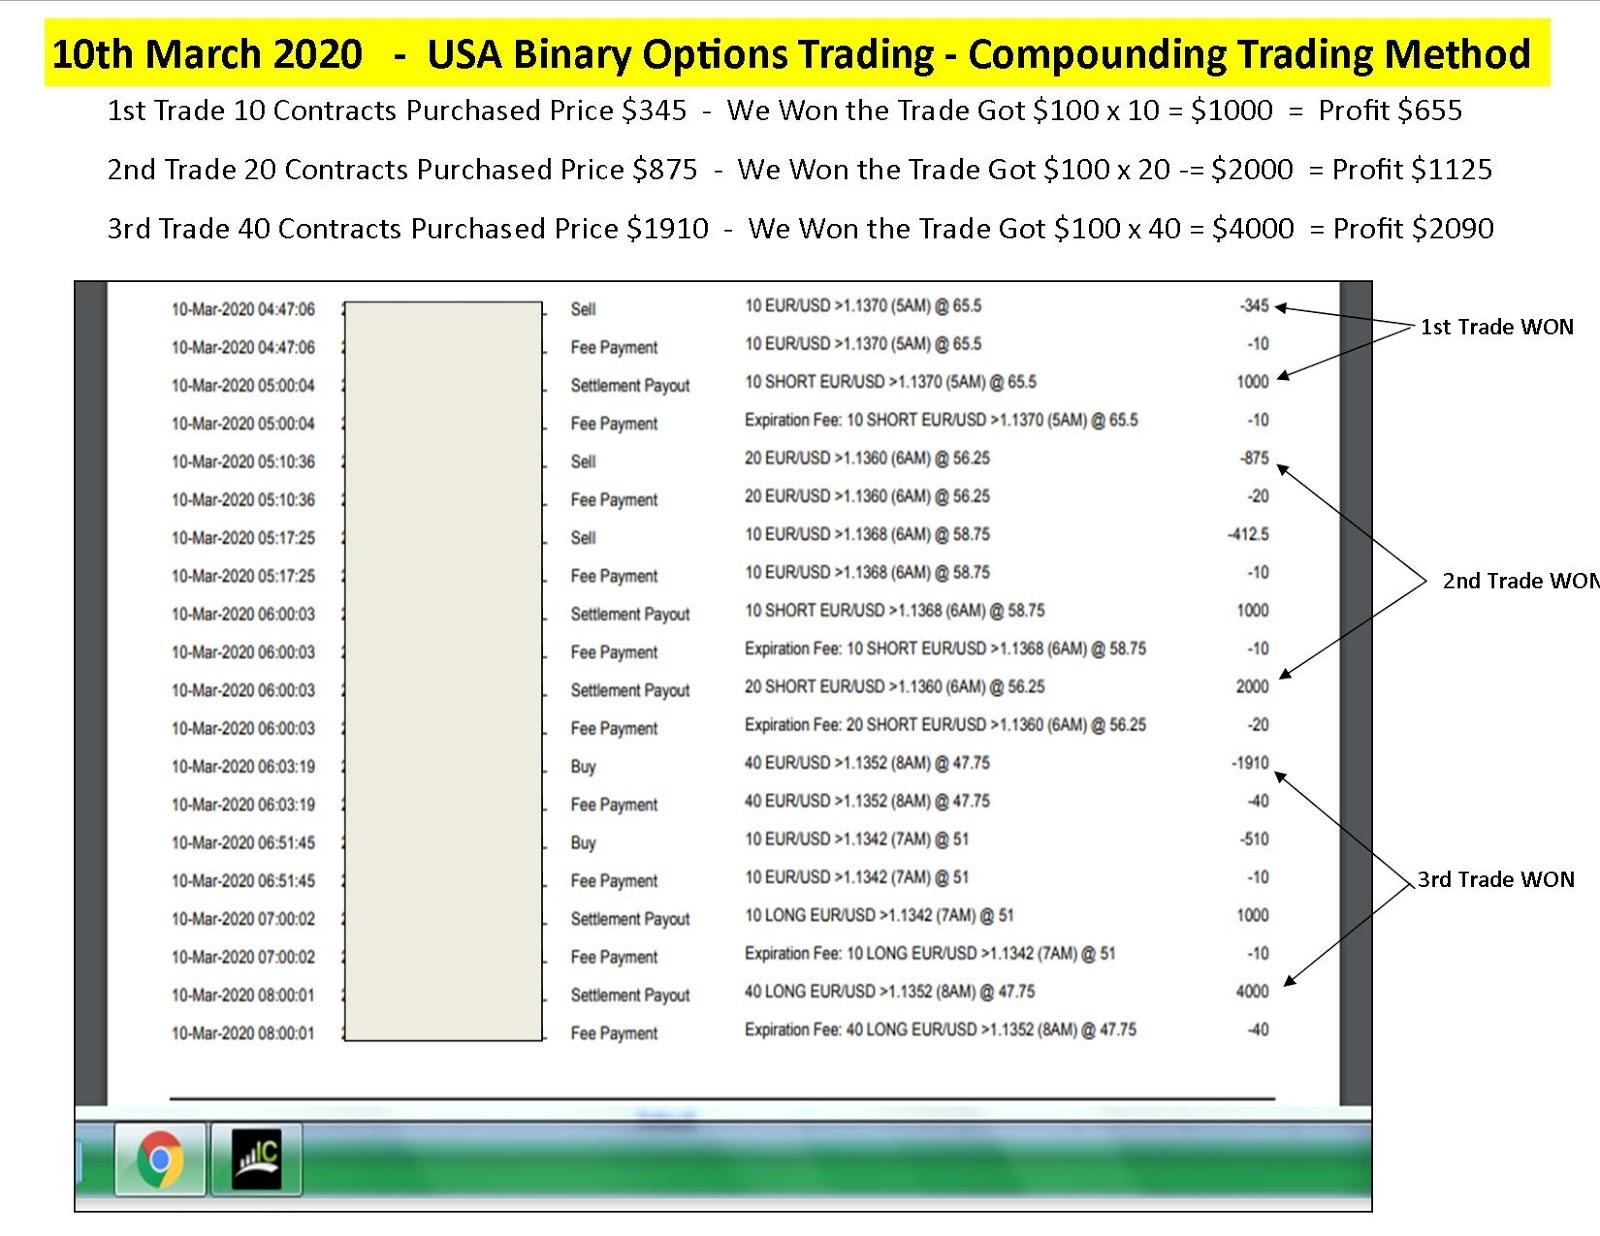 3d models - Export STL as ASCII or binary? - 3D Printing Stack Exchange